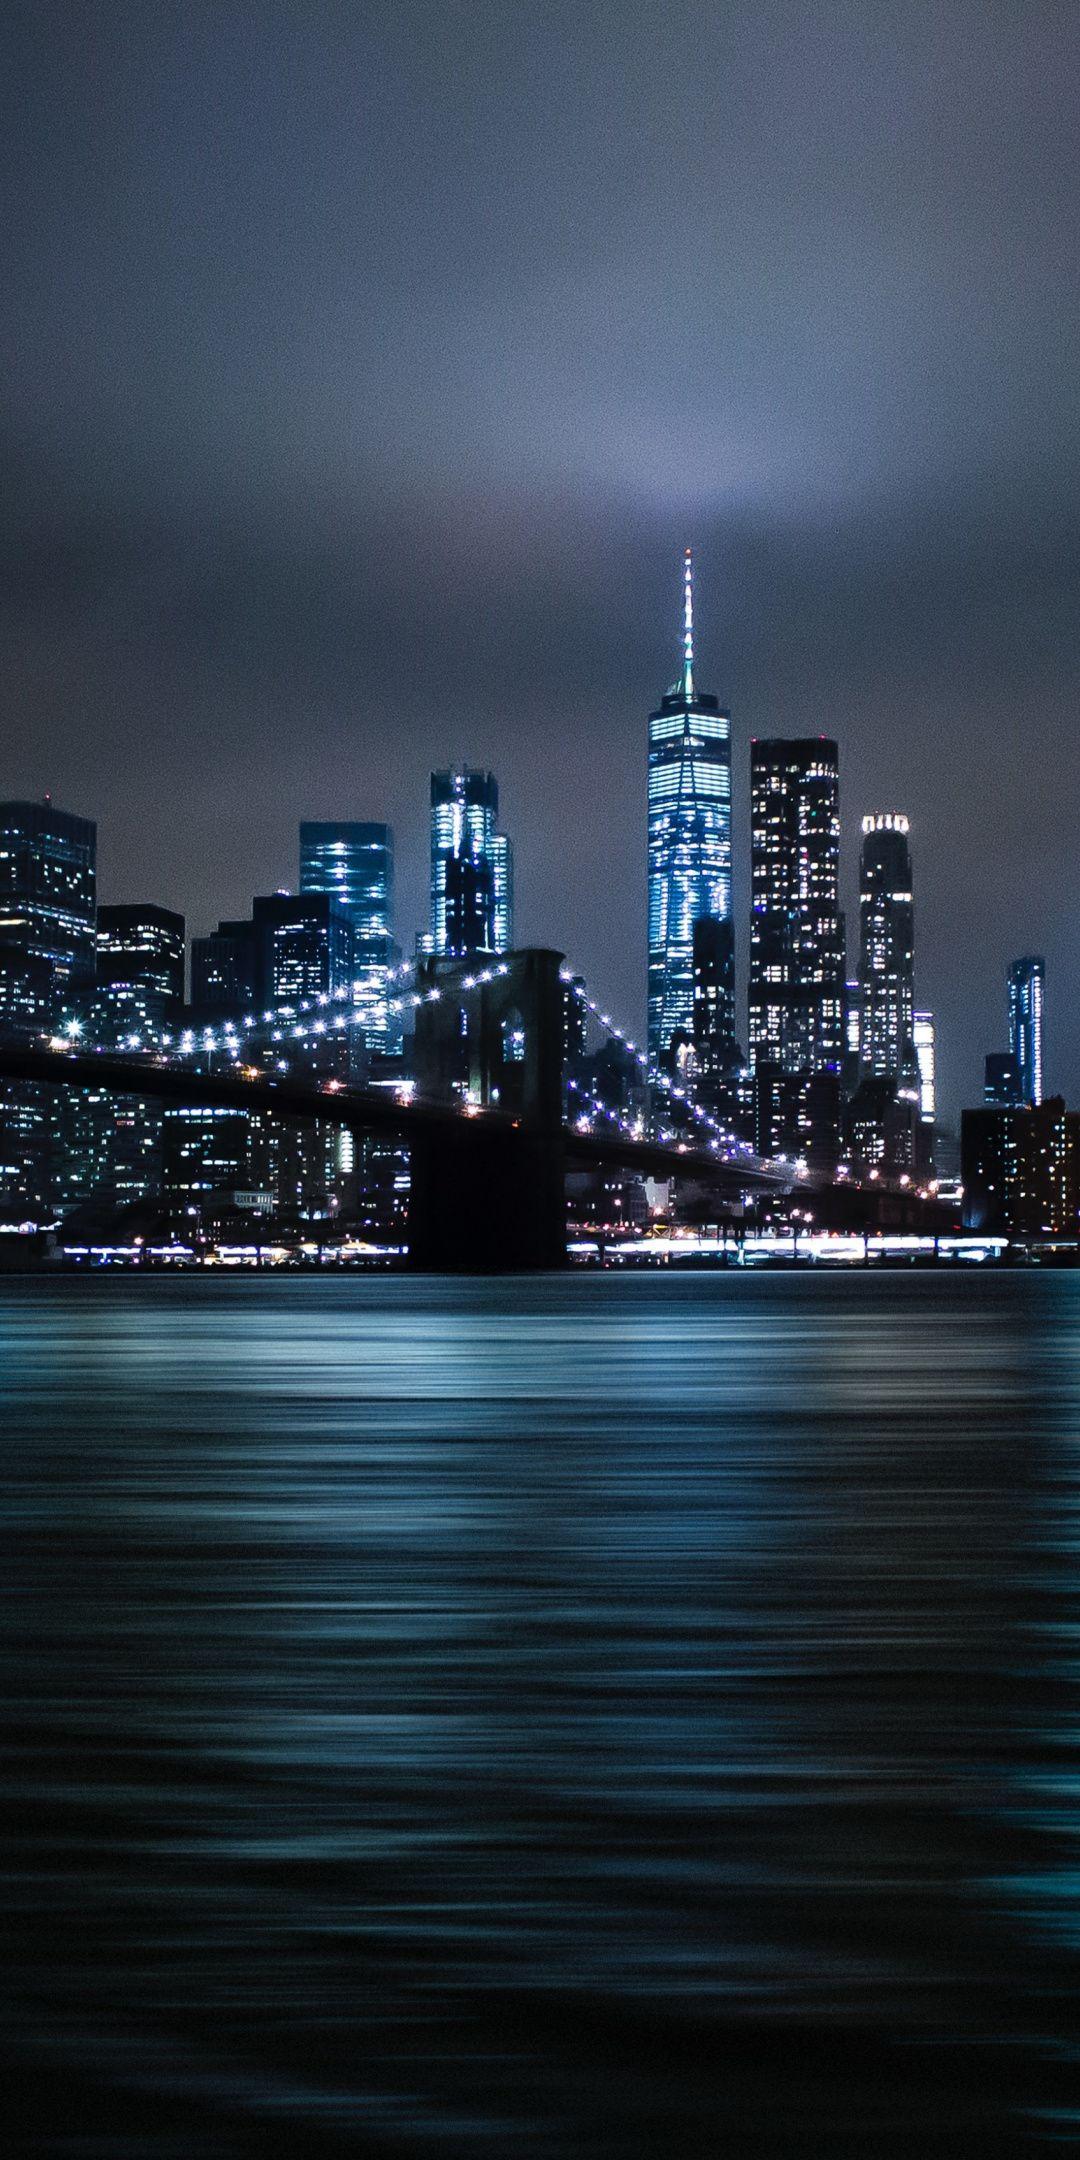 Dark Night Buildings Cityscape Wallpaper Cityscape Wallpaper Cityscape City Wallpaper